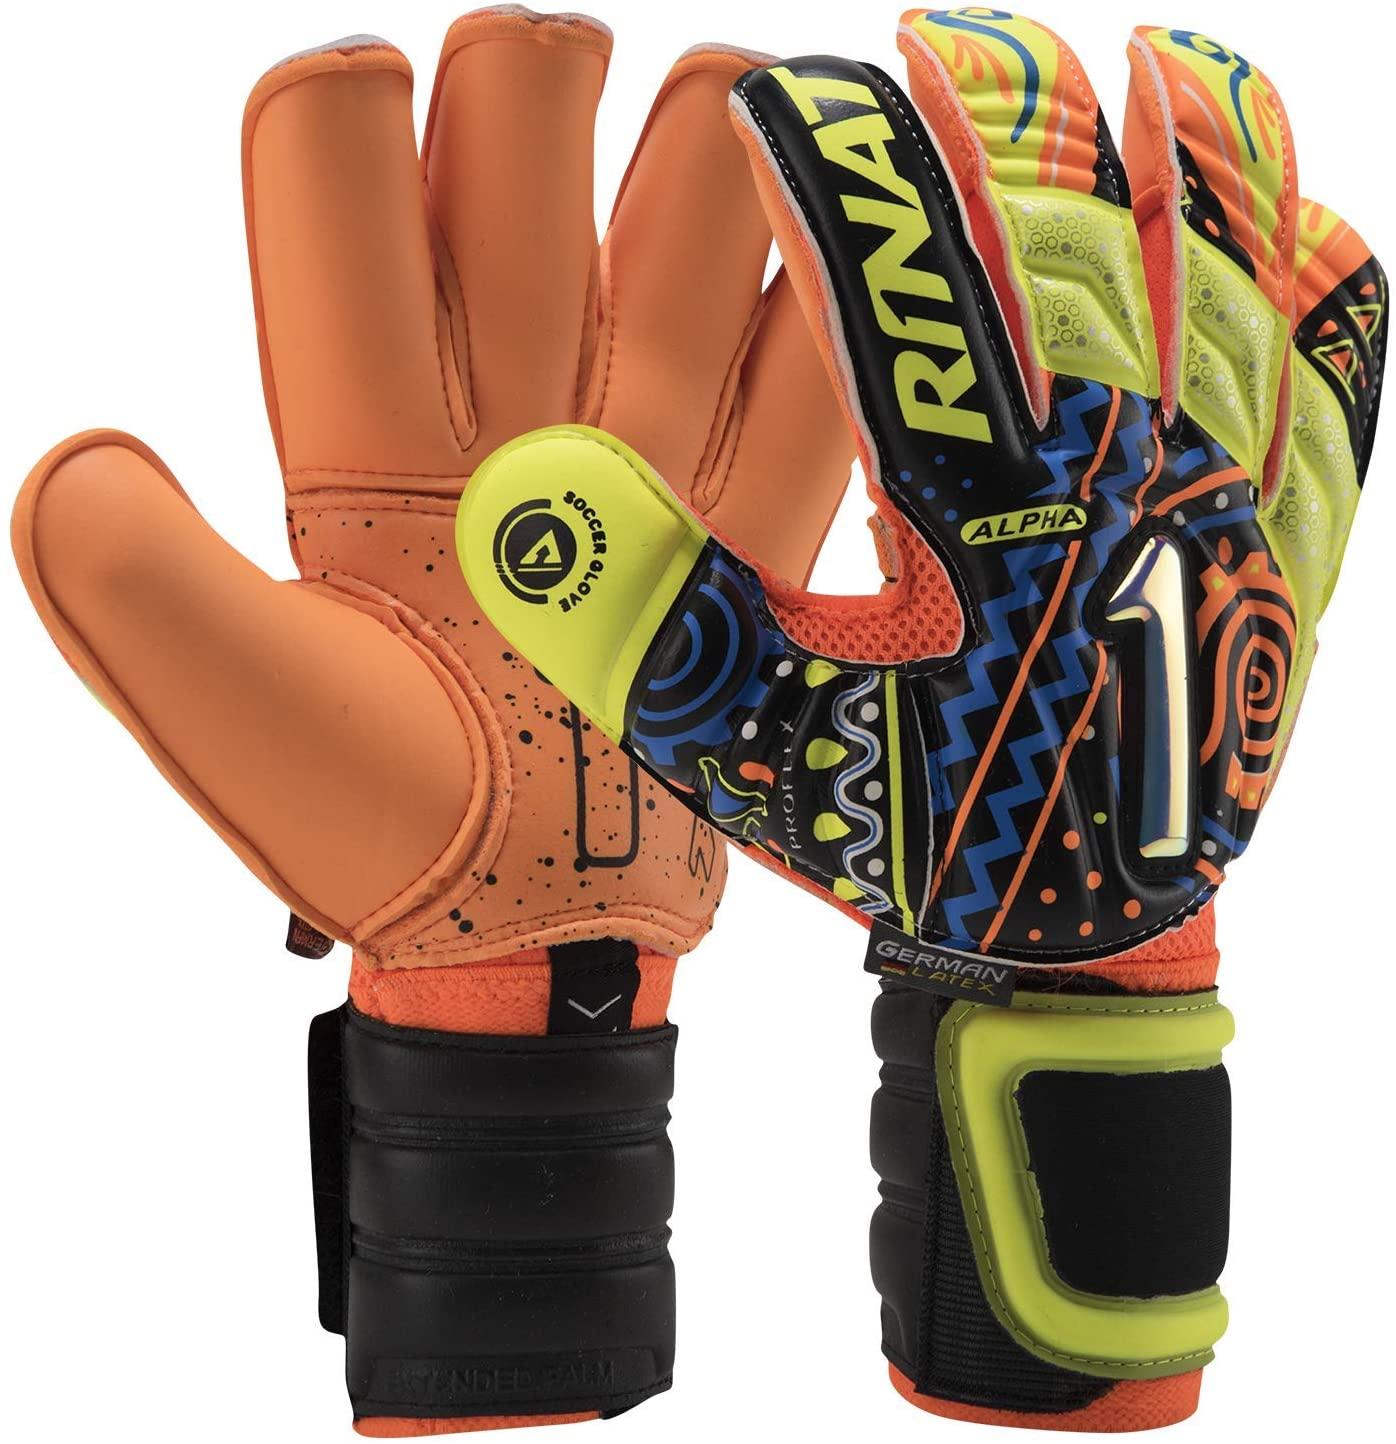 Rinat Soccer Goalkeeper Glove Uno Alpha Pro Training Free Customization & Pin